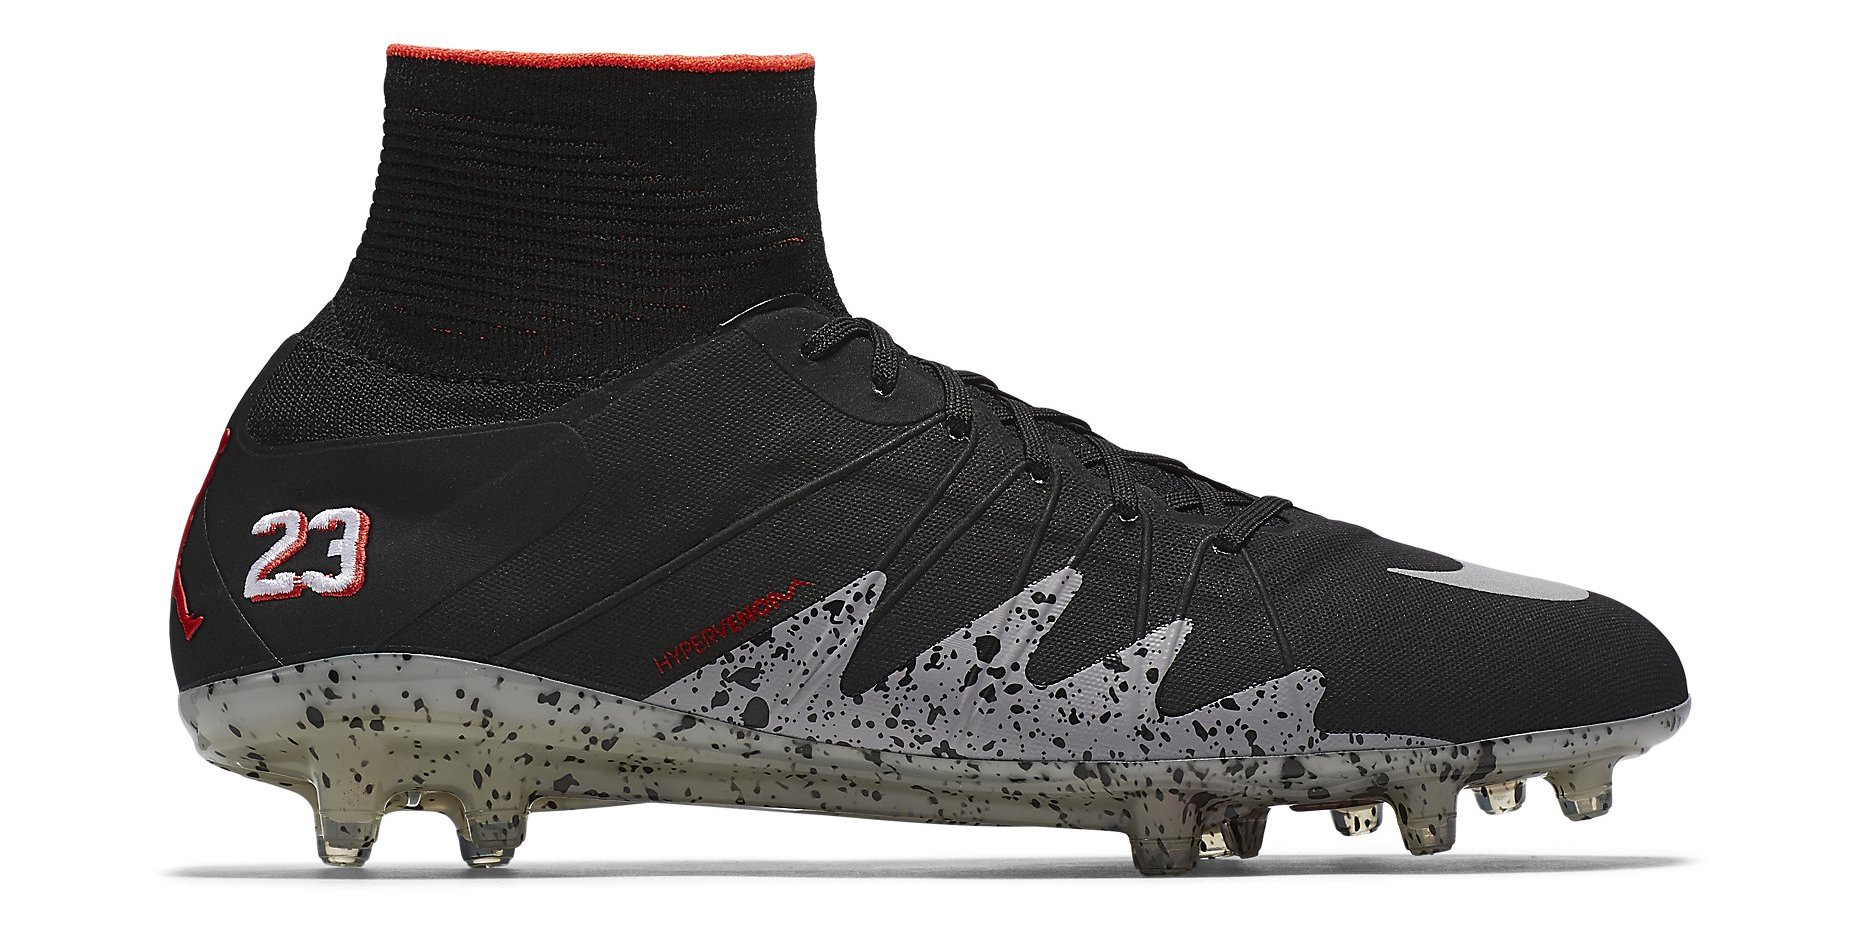 Kopačky Nike Hypervenom Phantom II Neymar JR x Jordan FG